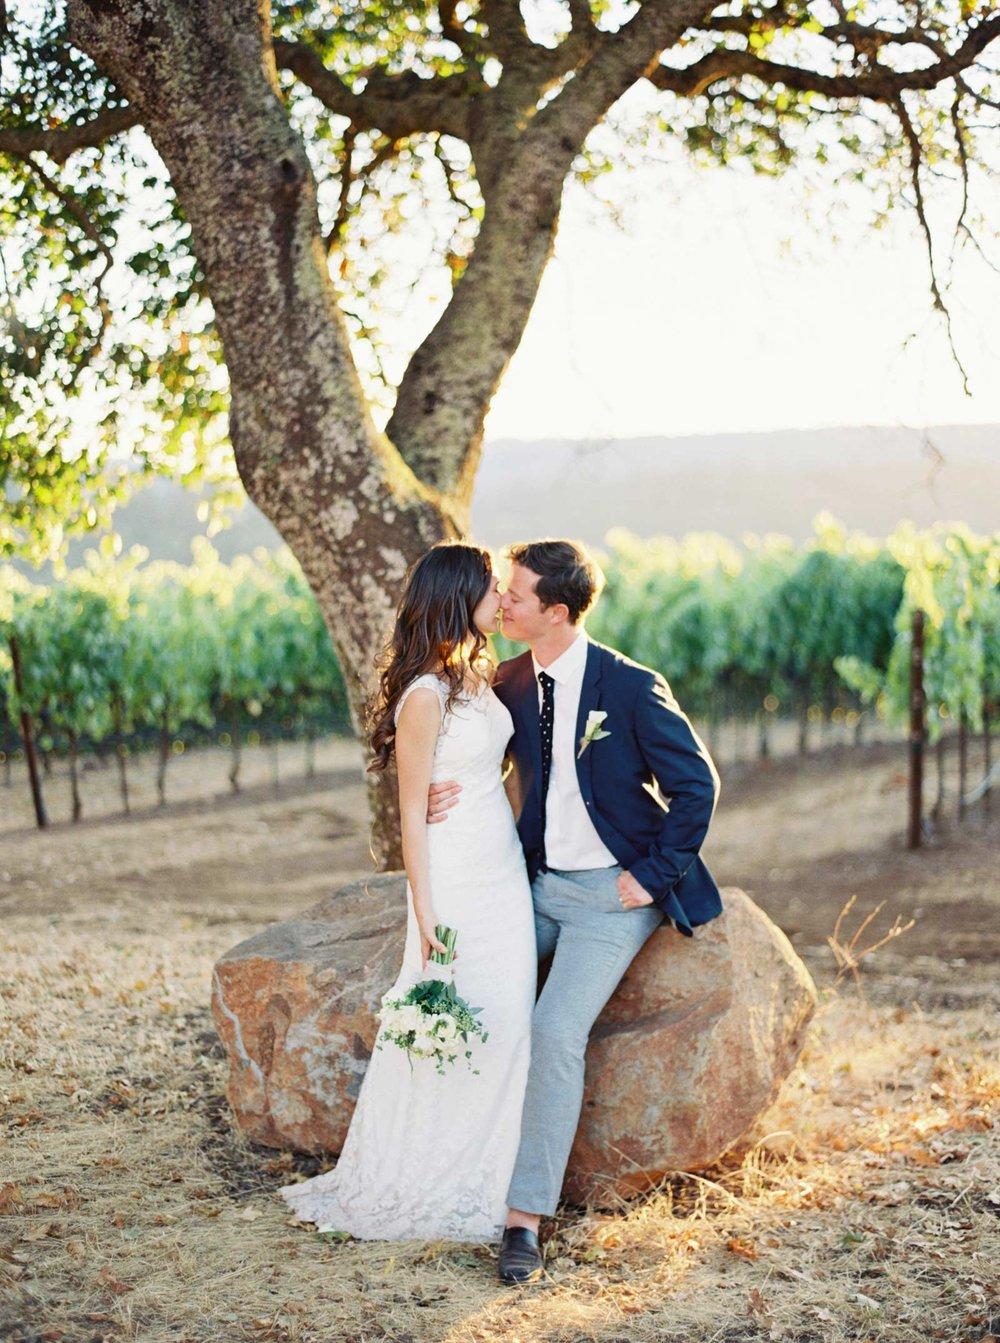 Napa-wedding-Kunde-winery-001.jpg